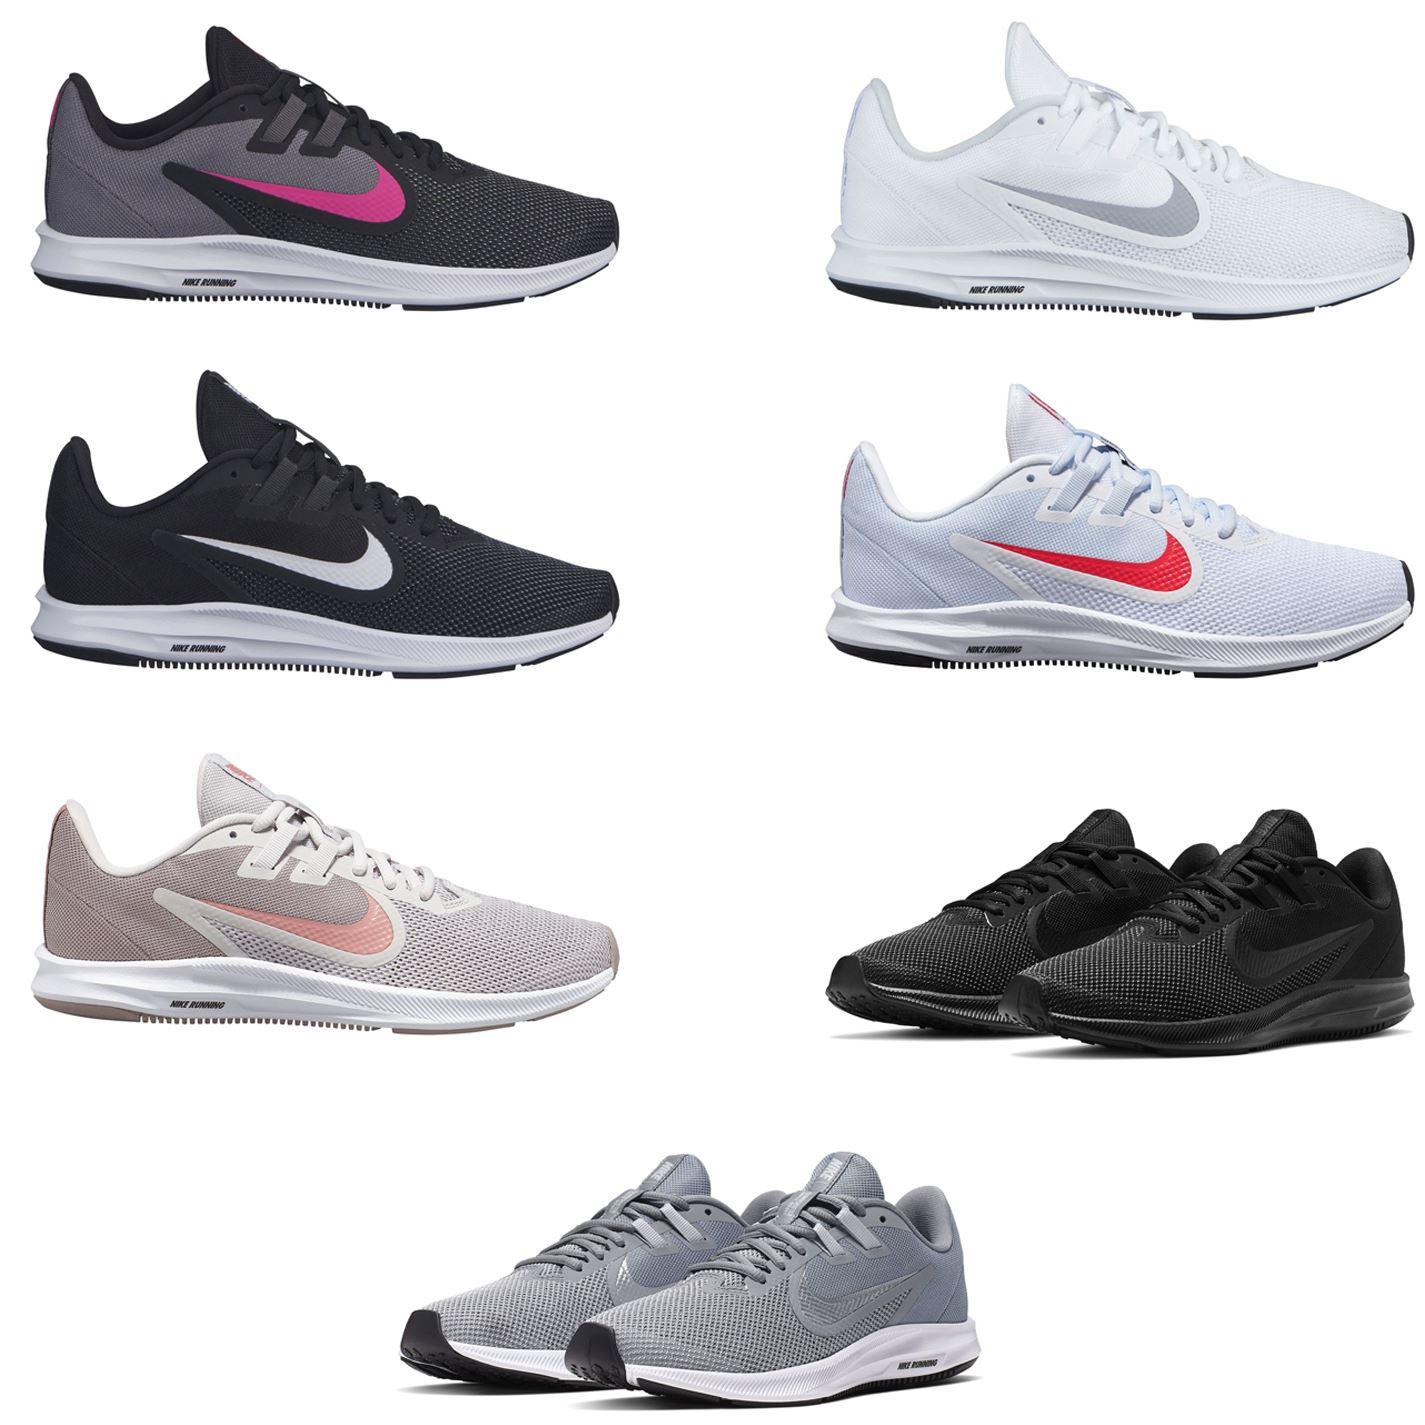 Mansedumbre Armario Sonrisa  Nike Downshifter 9 Zapatillas Mujer Zapatos Mujer Correr Zapatillas Calzado  | eBay